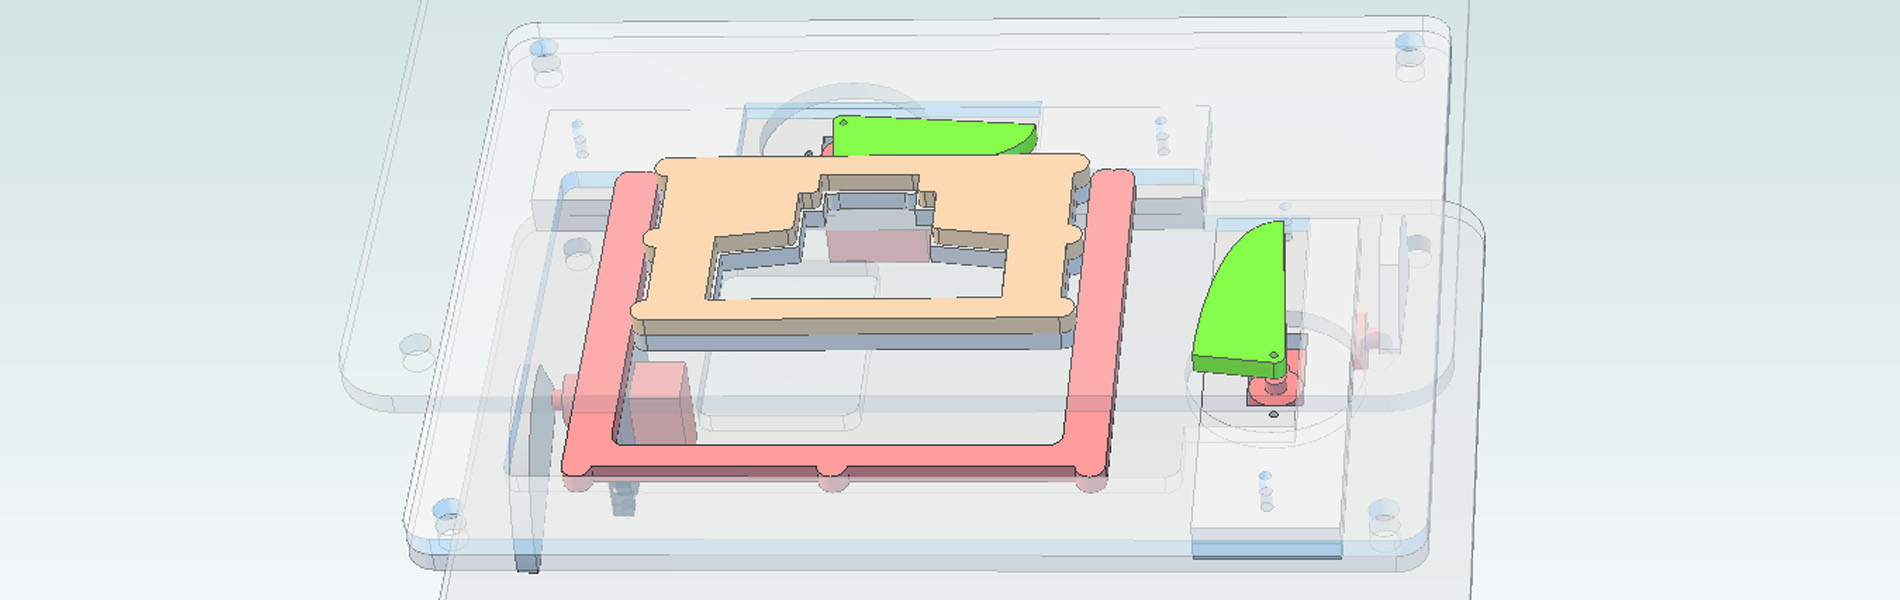 Modelowanie CAD